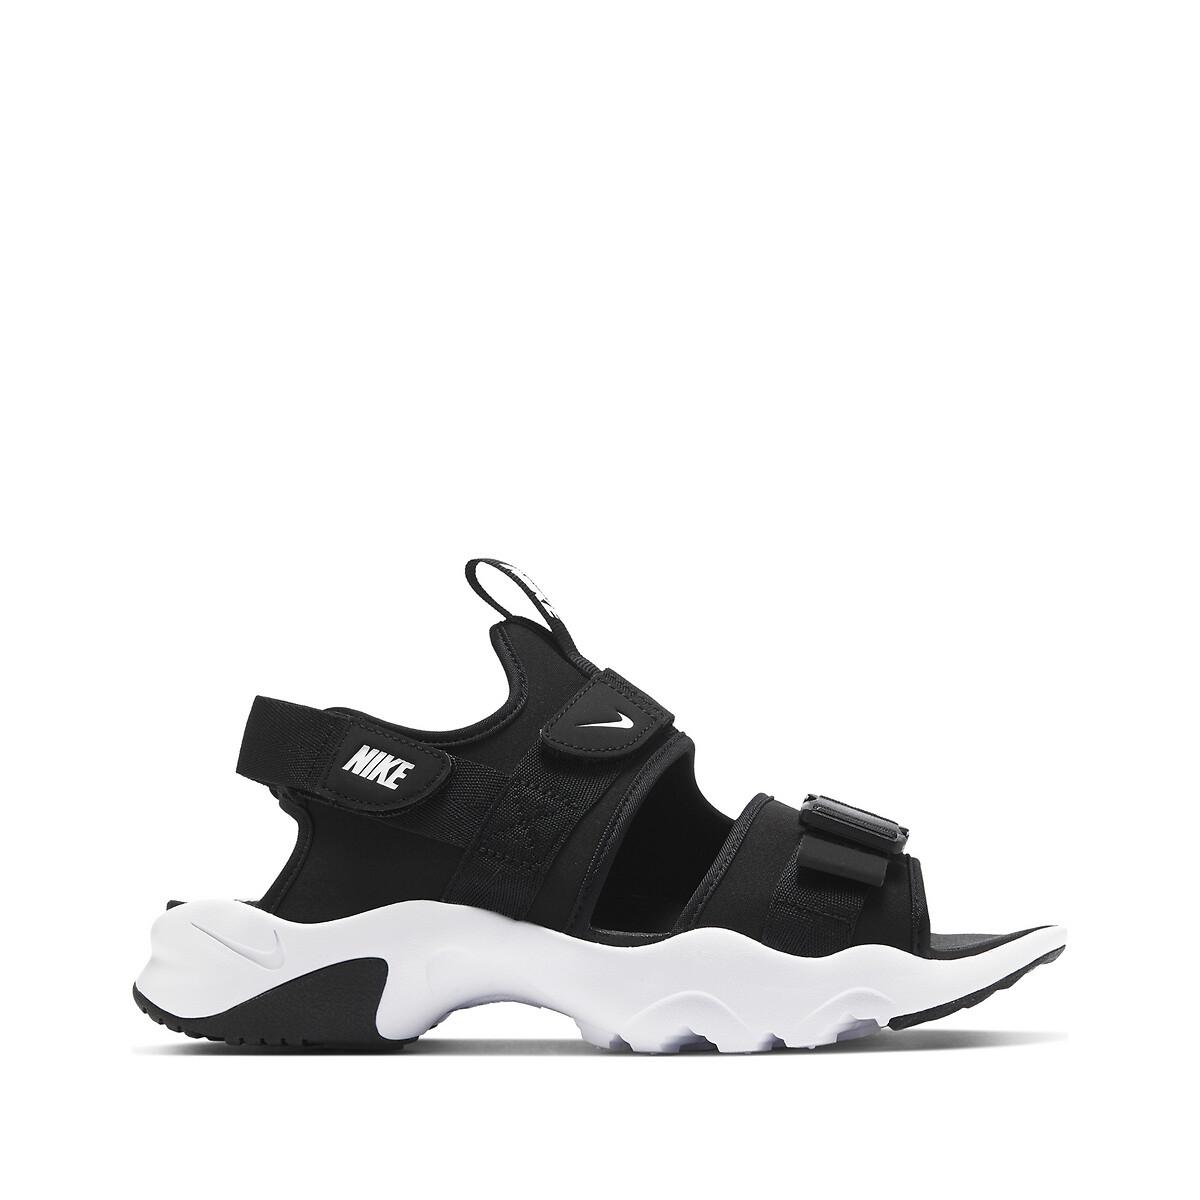 Nike Canyon outdoor sandalen zwart/wit online kopen